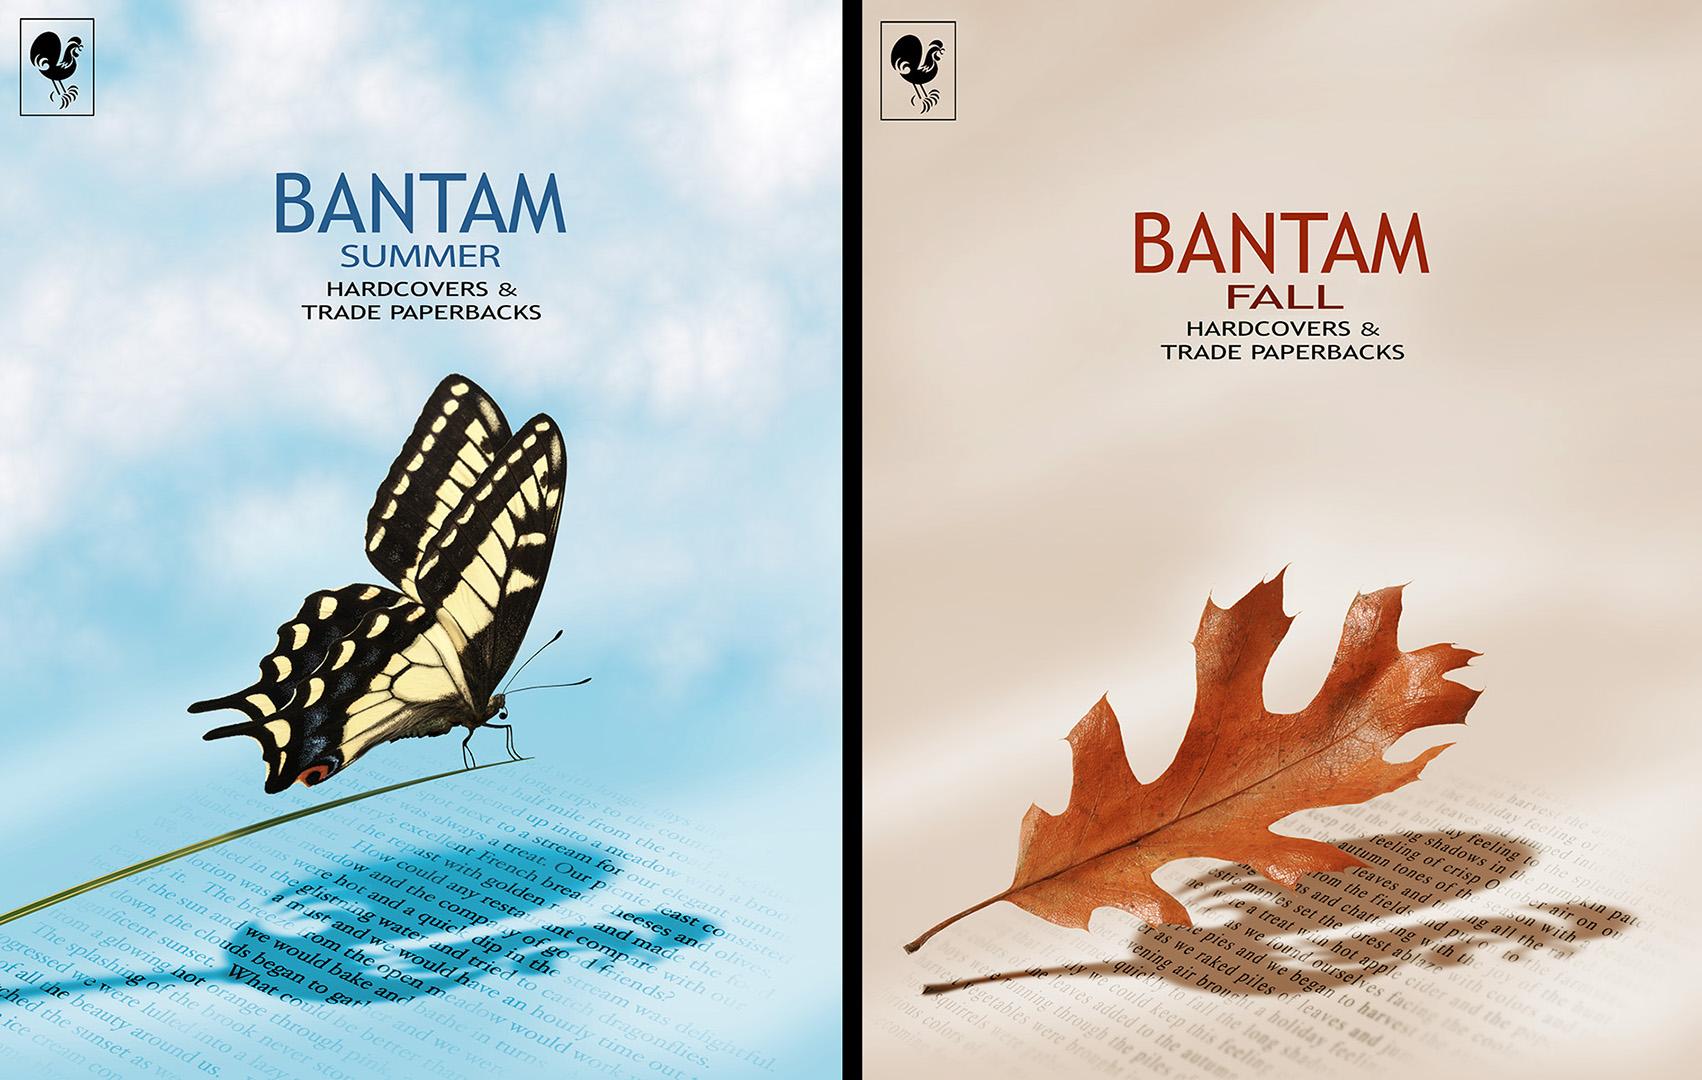 Bantam-Leaf_Butterfly.jpg